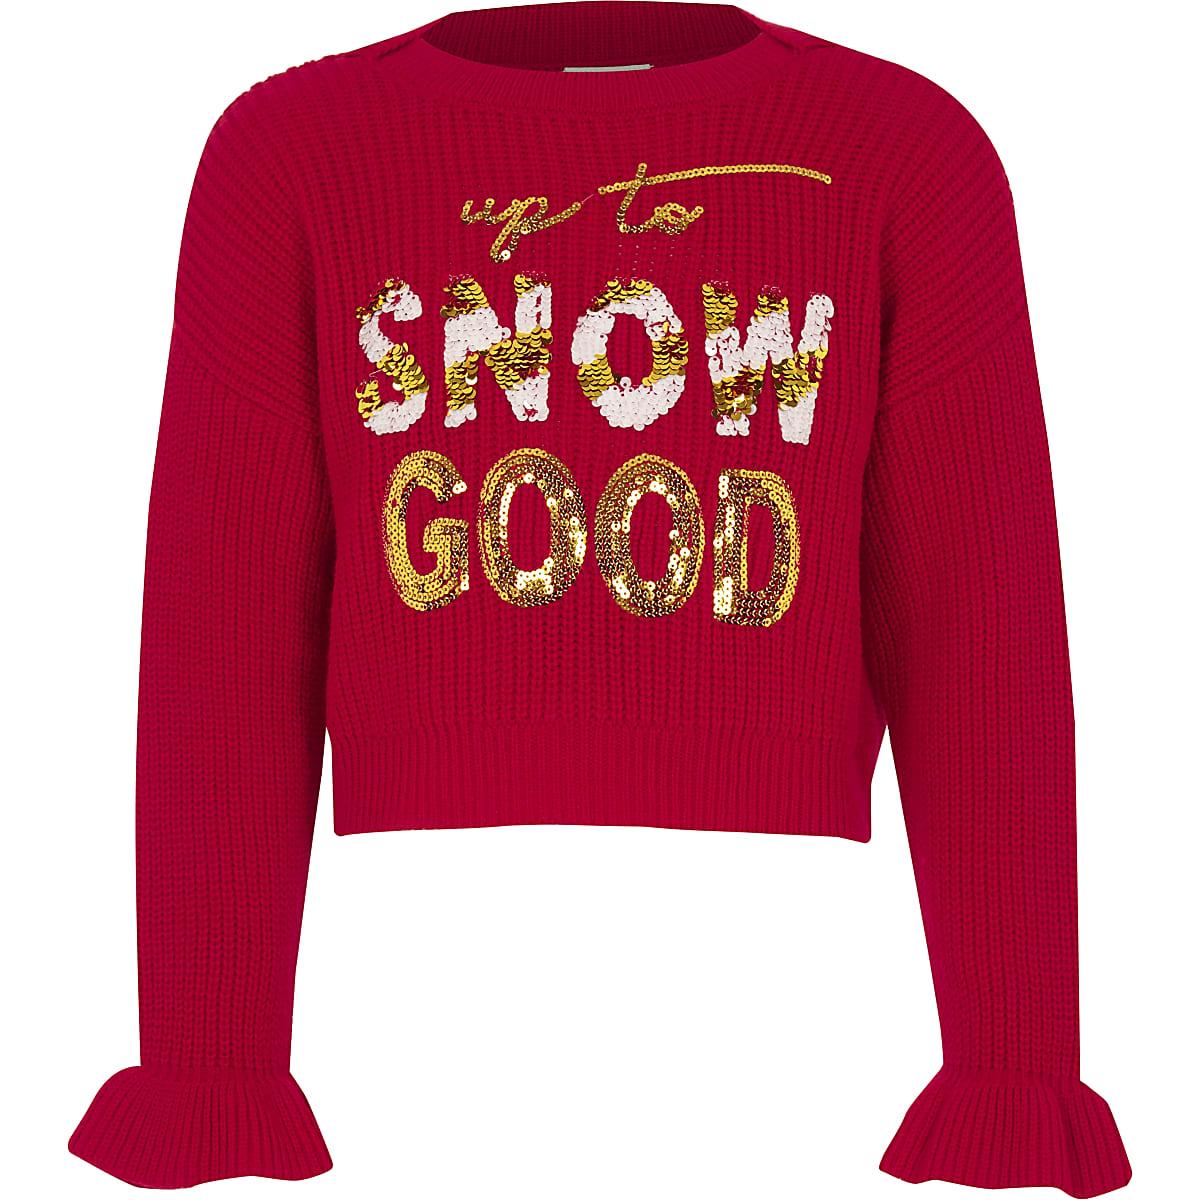 Girls red 'Snow good' Christmas jumper